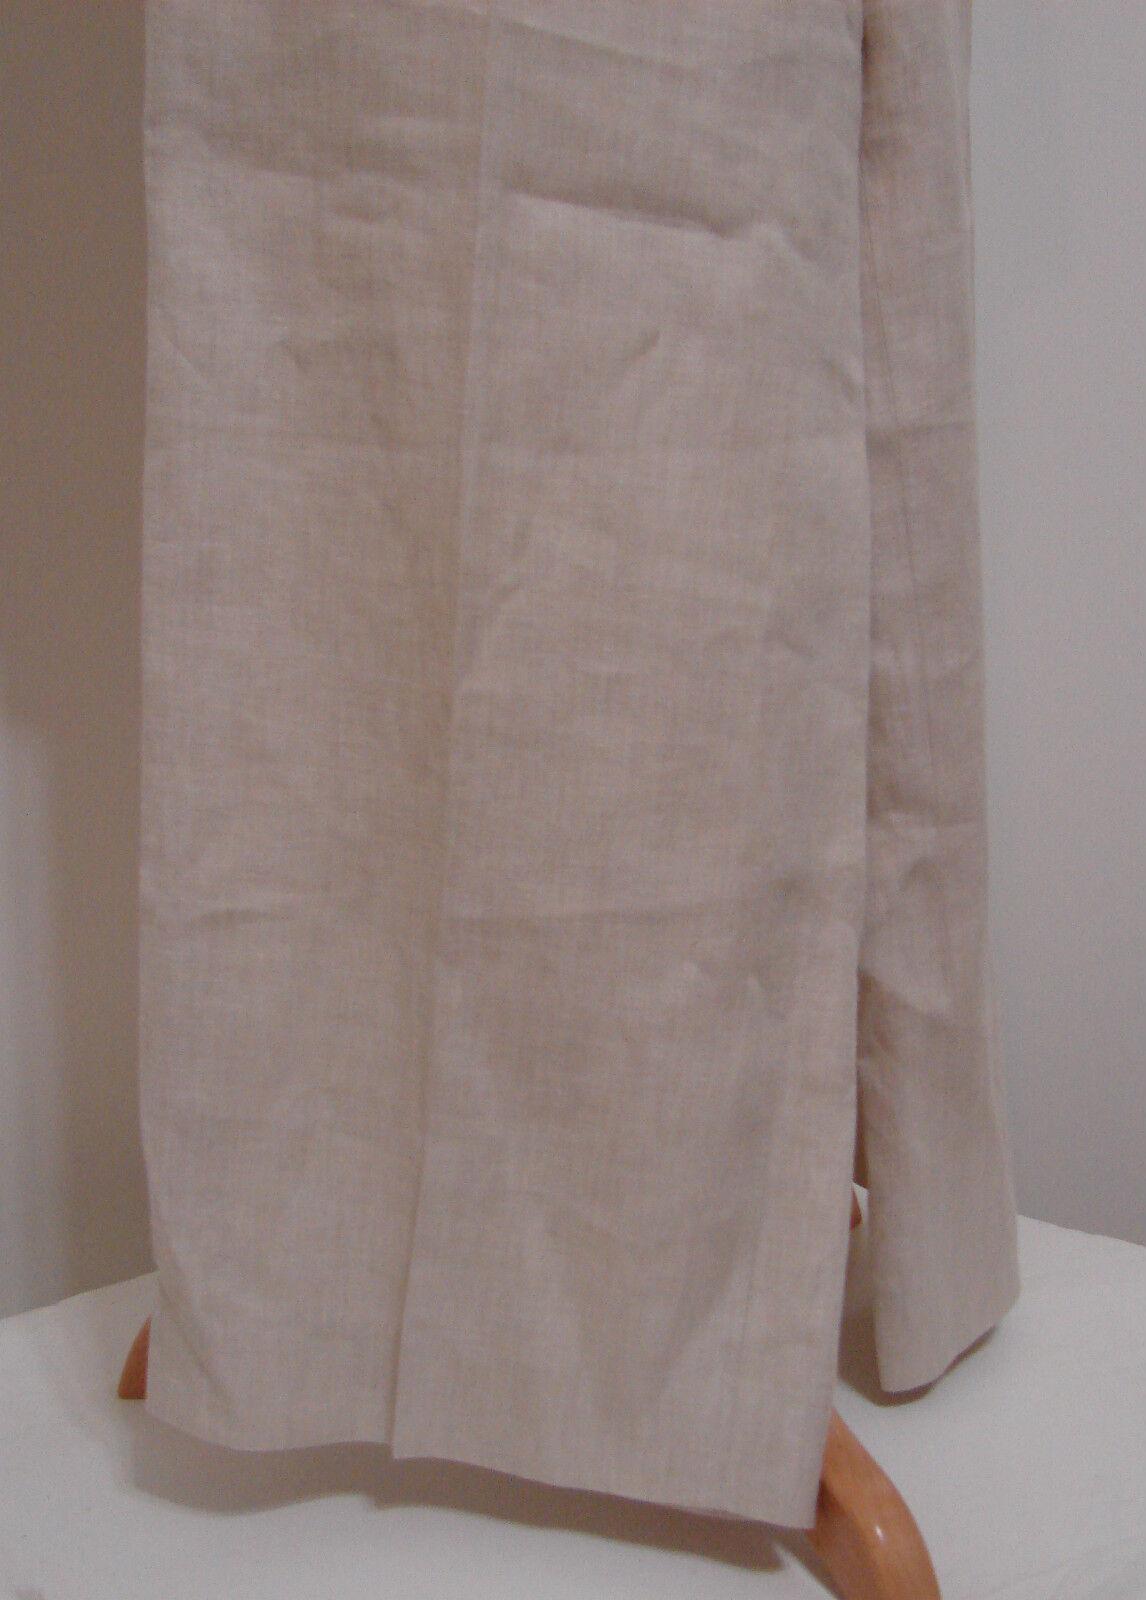 Donna Karan DKNY Pant Suit & Jacket Cream 100% Li… - image 4